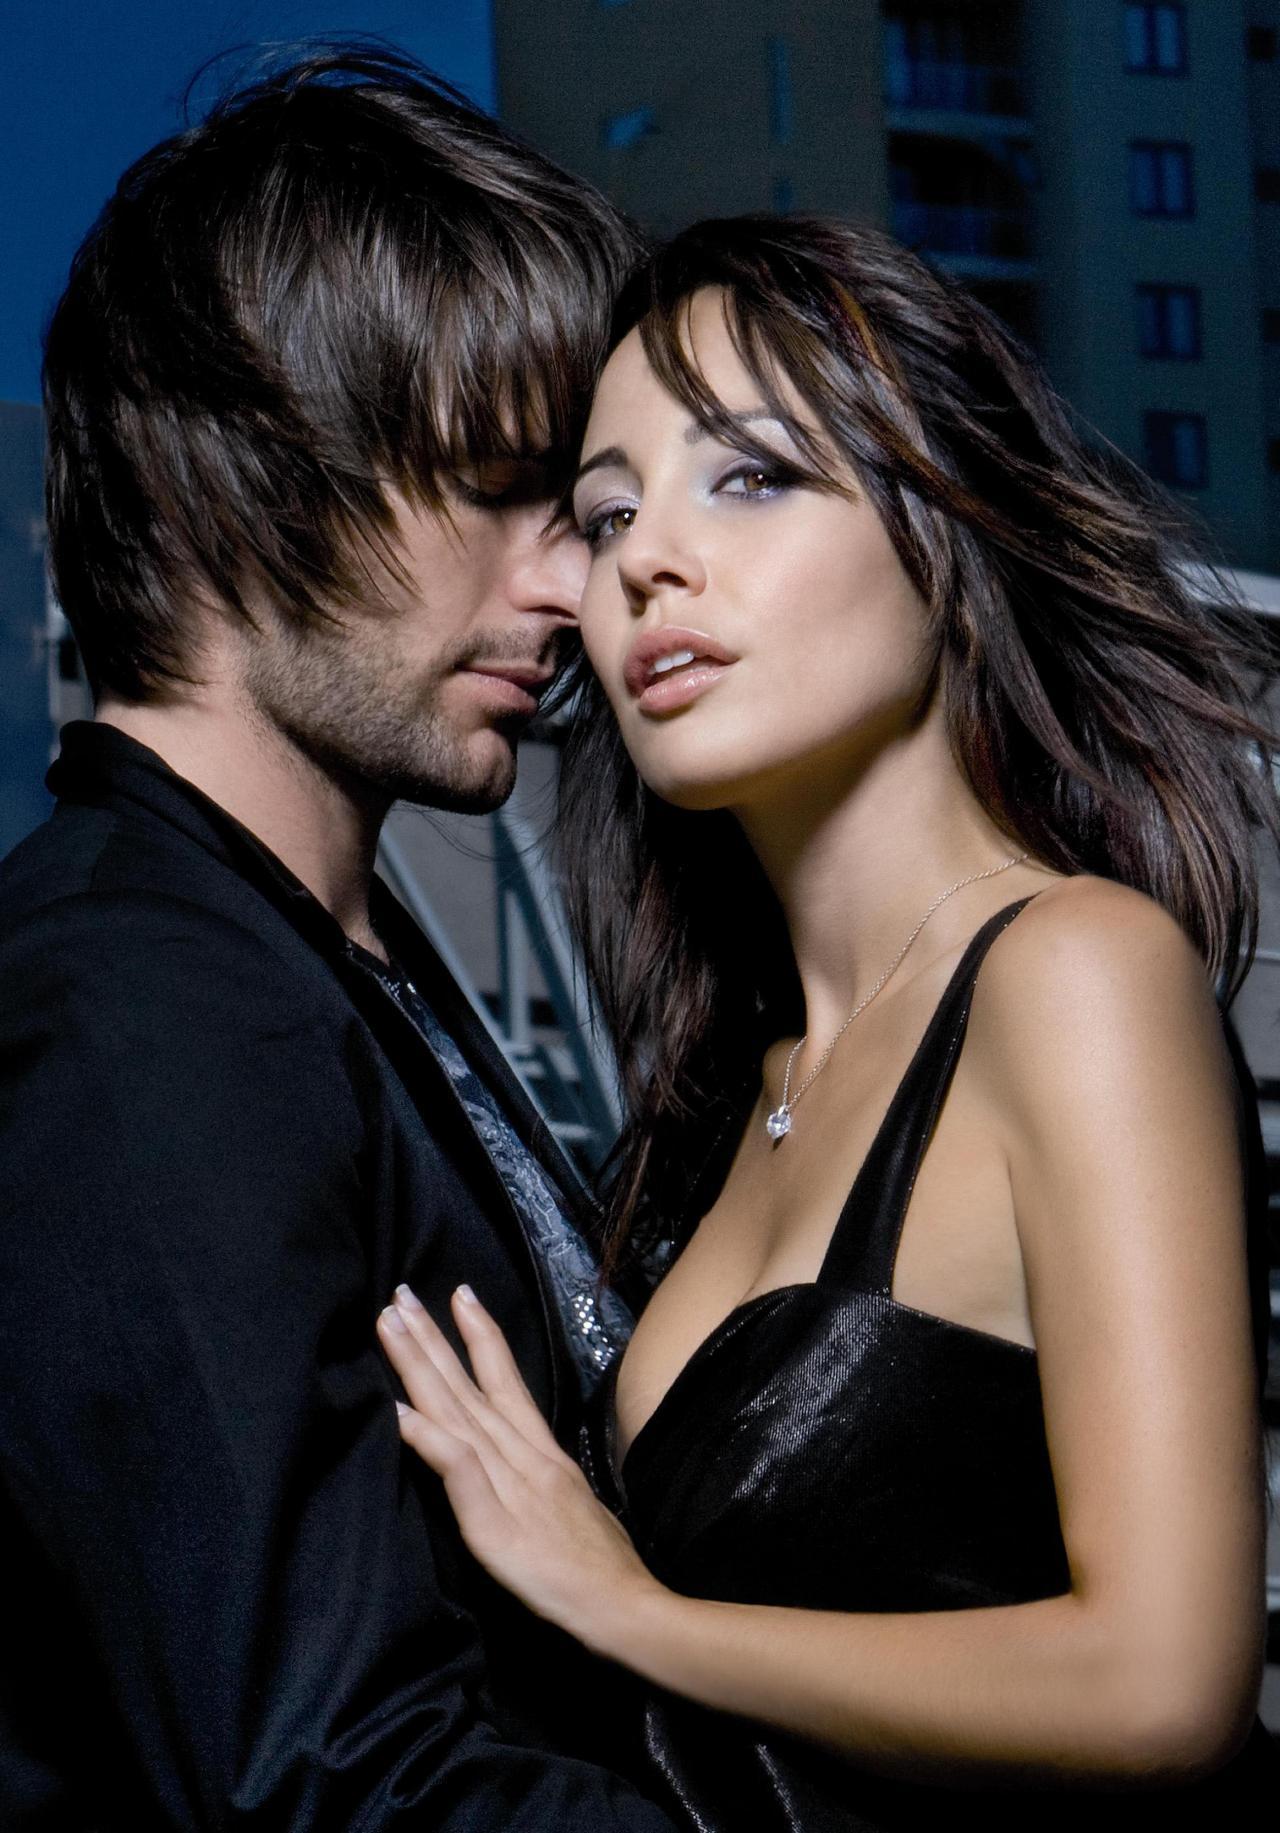 صور احضان وقبلات ساخنة , صور حب و رومانسيه - احضان الحب